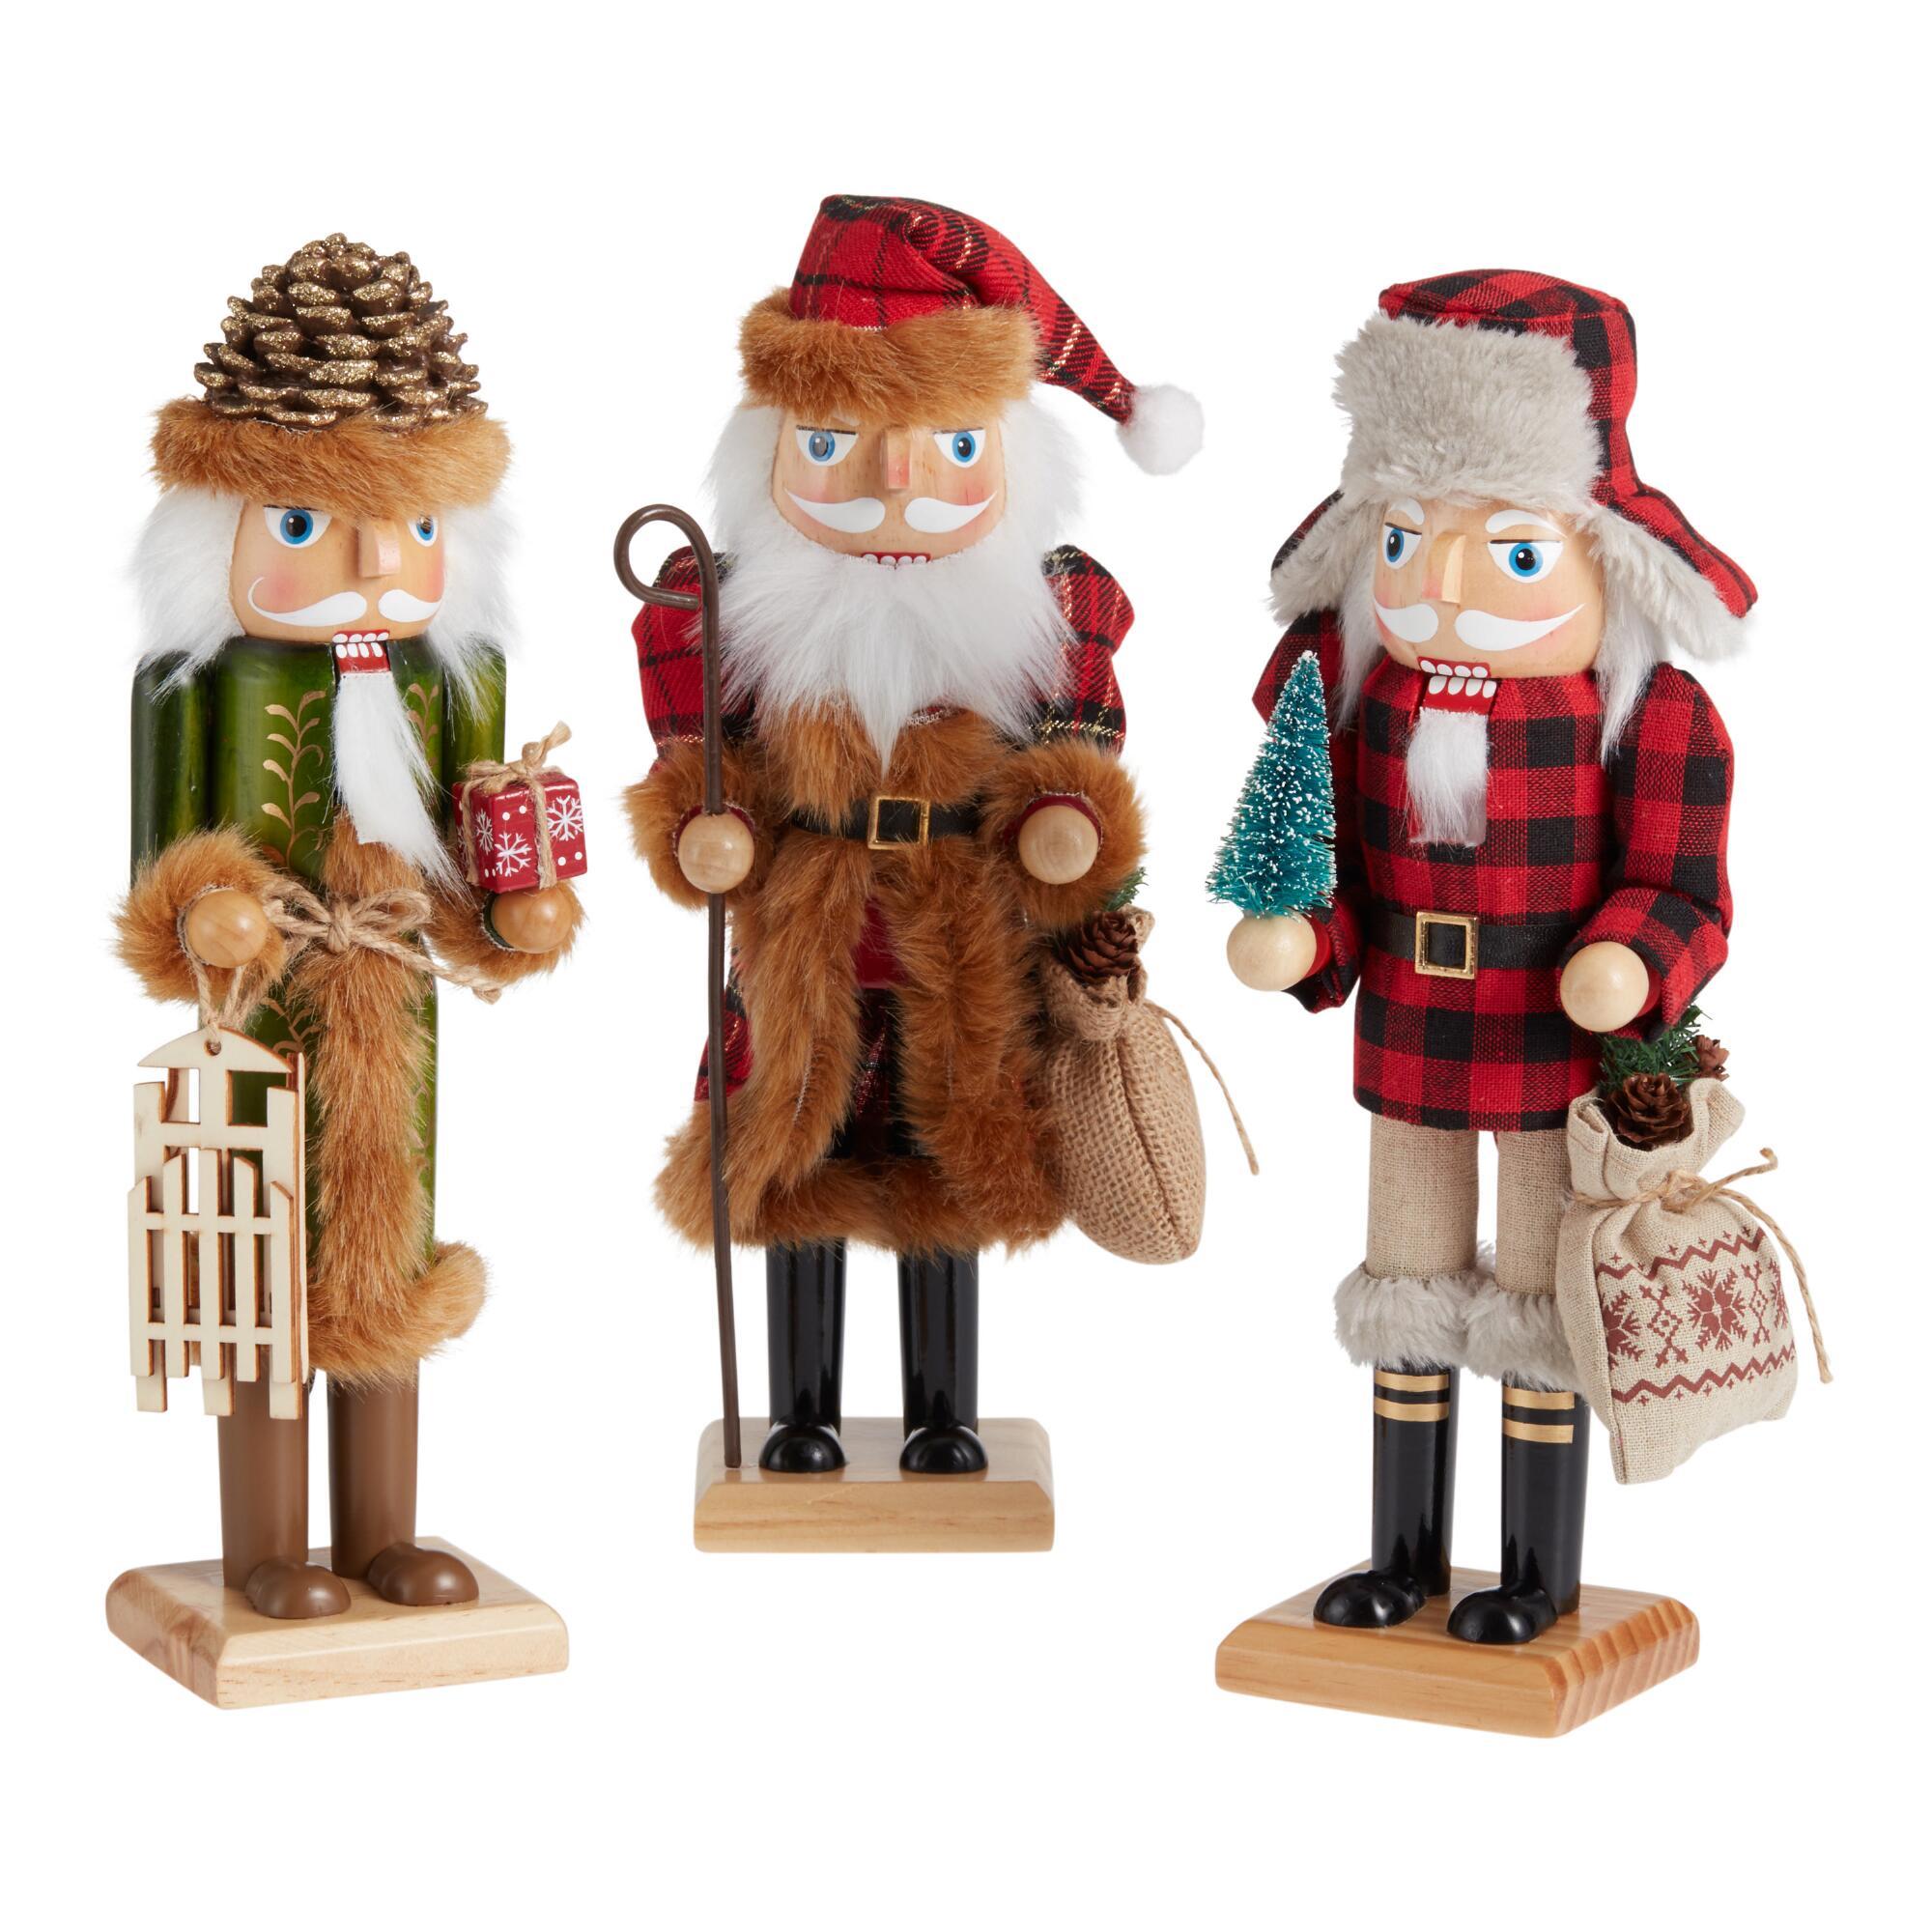 Rustic Woodland Santa Nutcrackers Set Of 3 $59.97